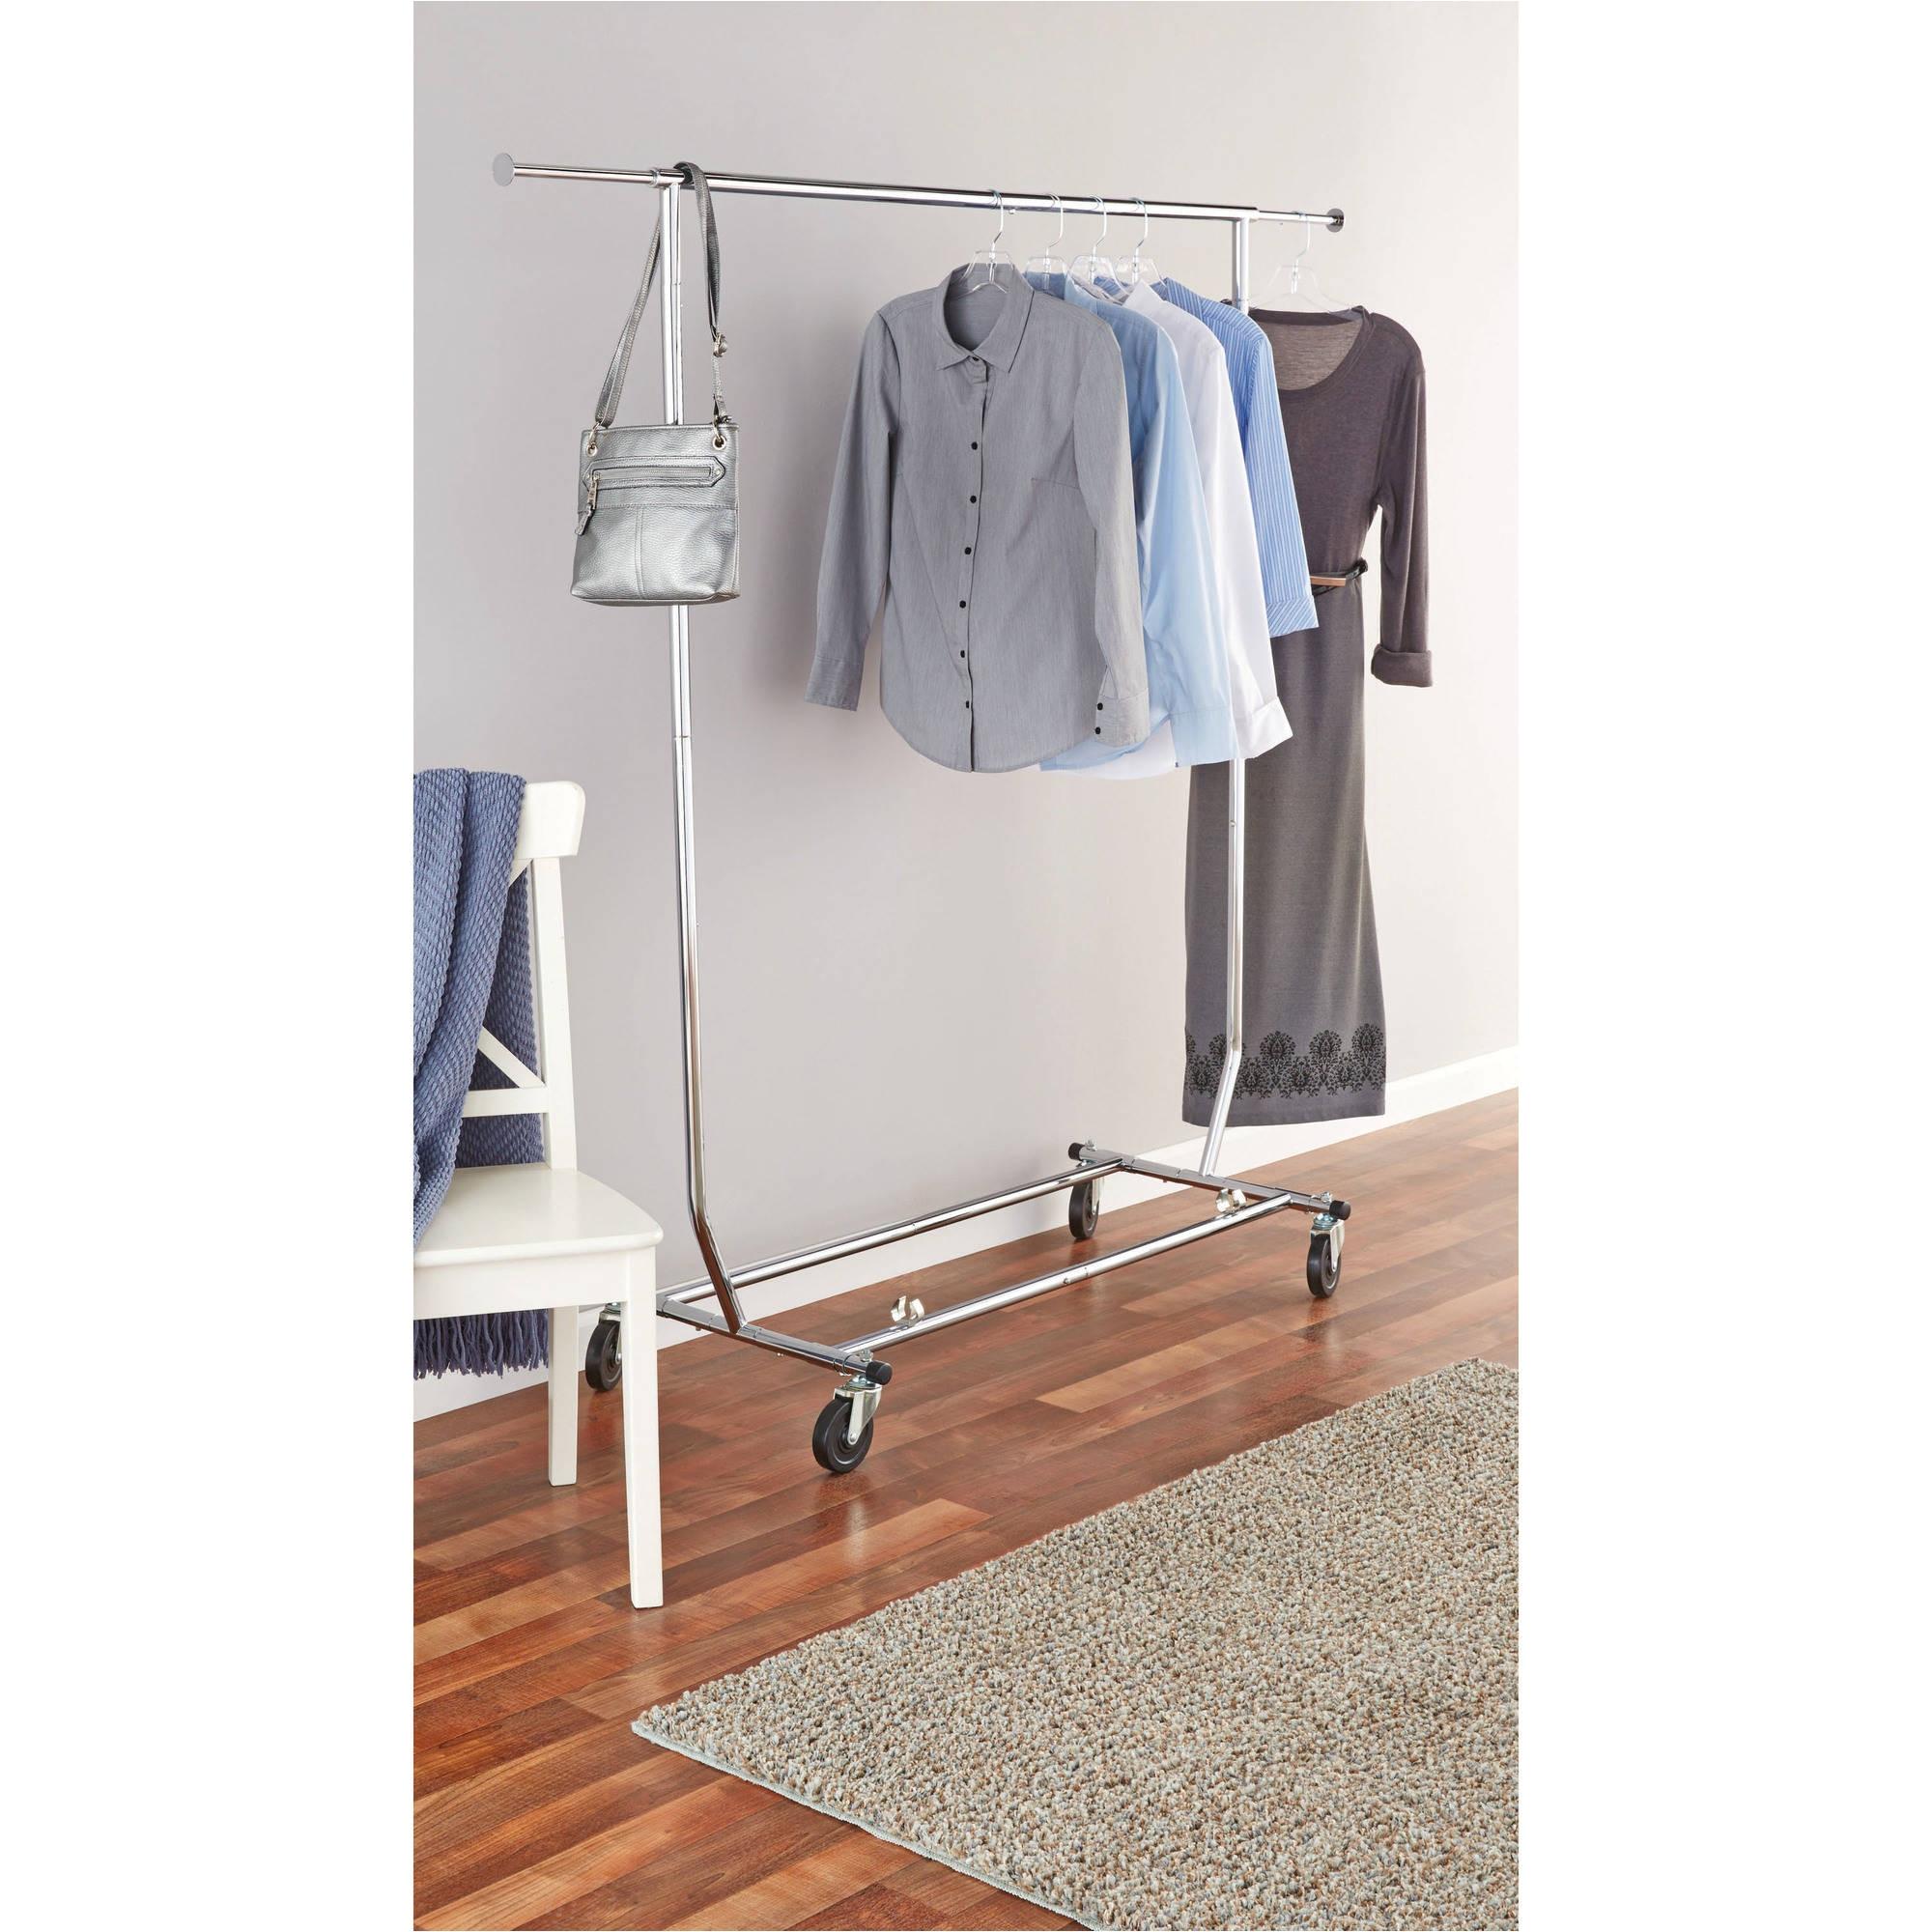 Walmart Mainstay Clothing Rack Ideas organizer Bins Walmart Clothes Rack Closet Storage as Well